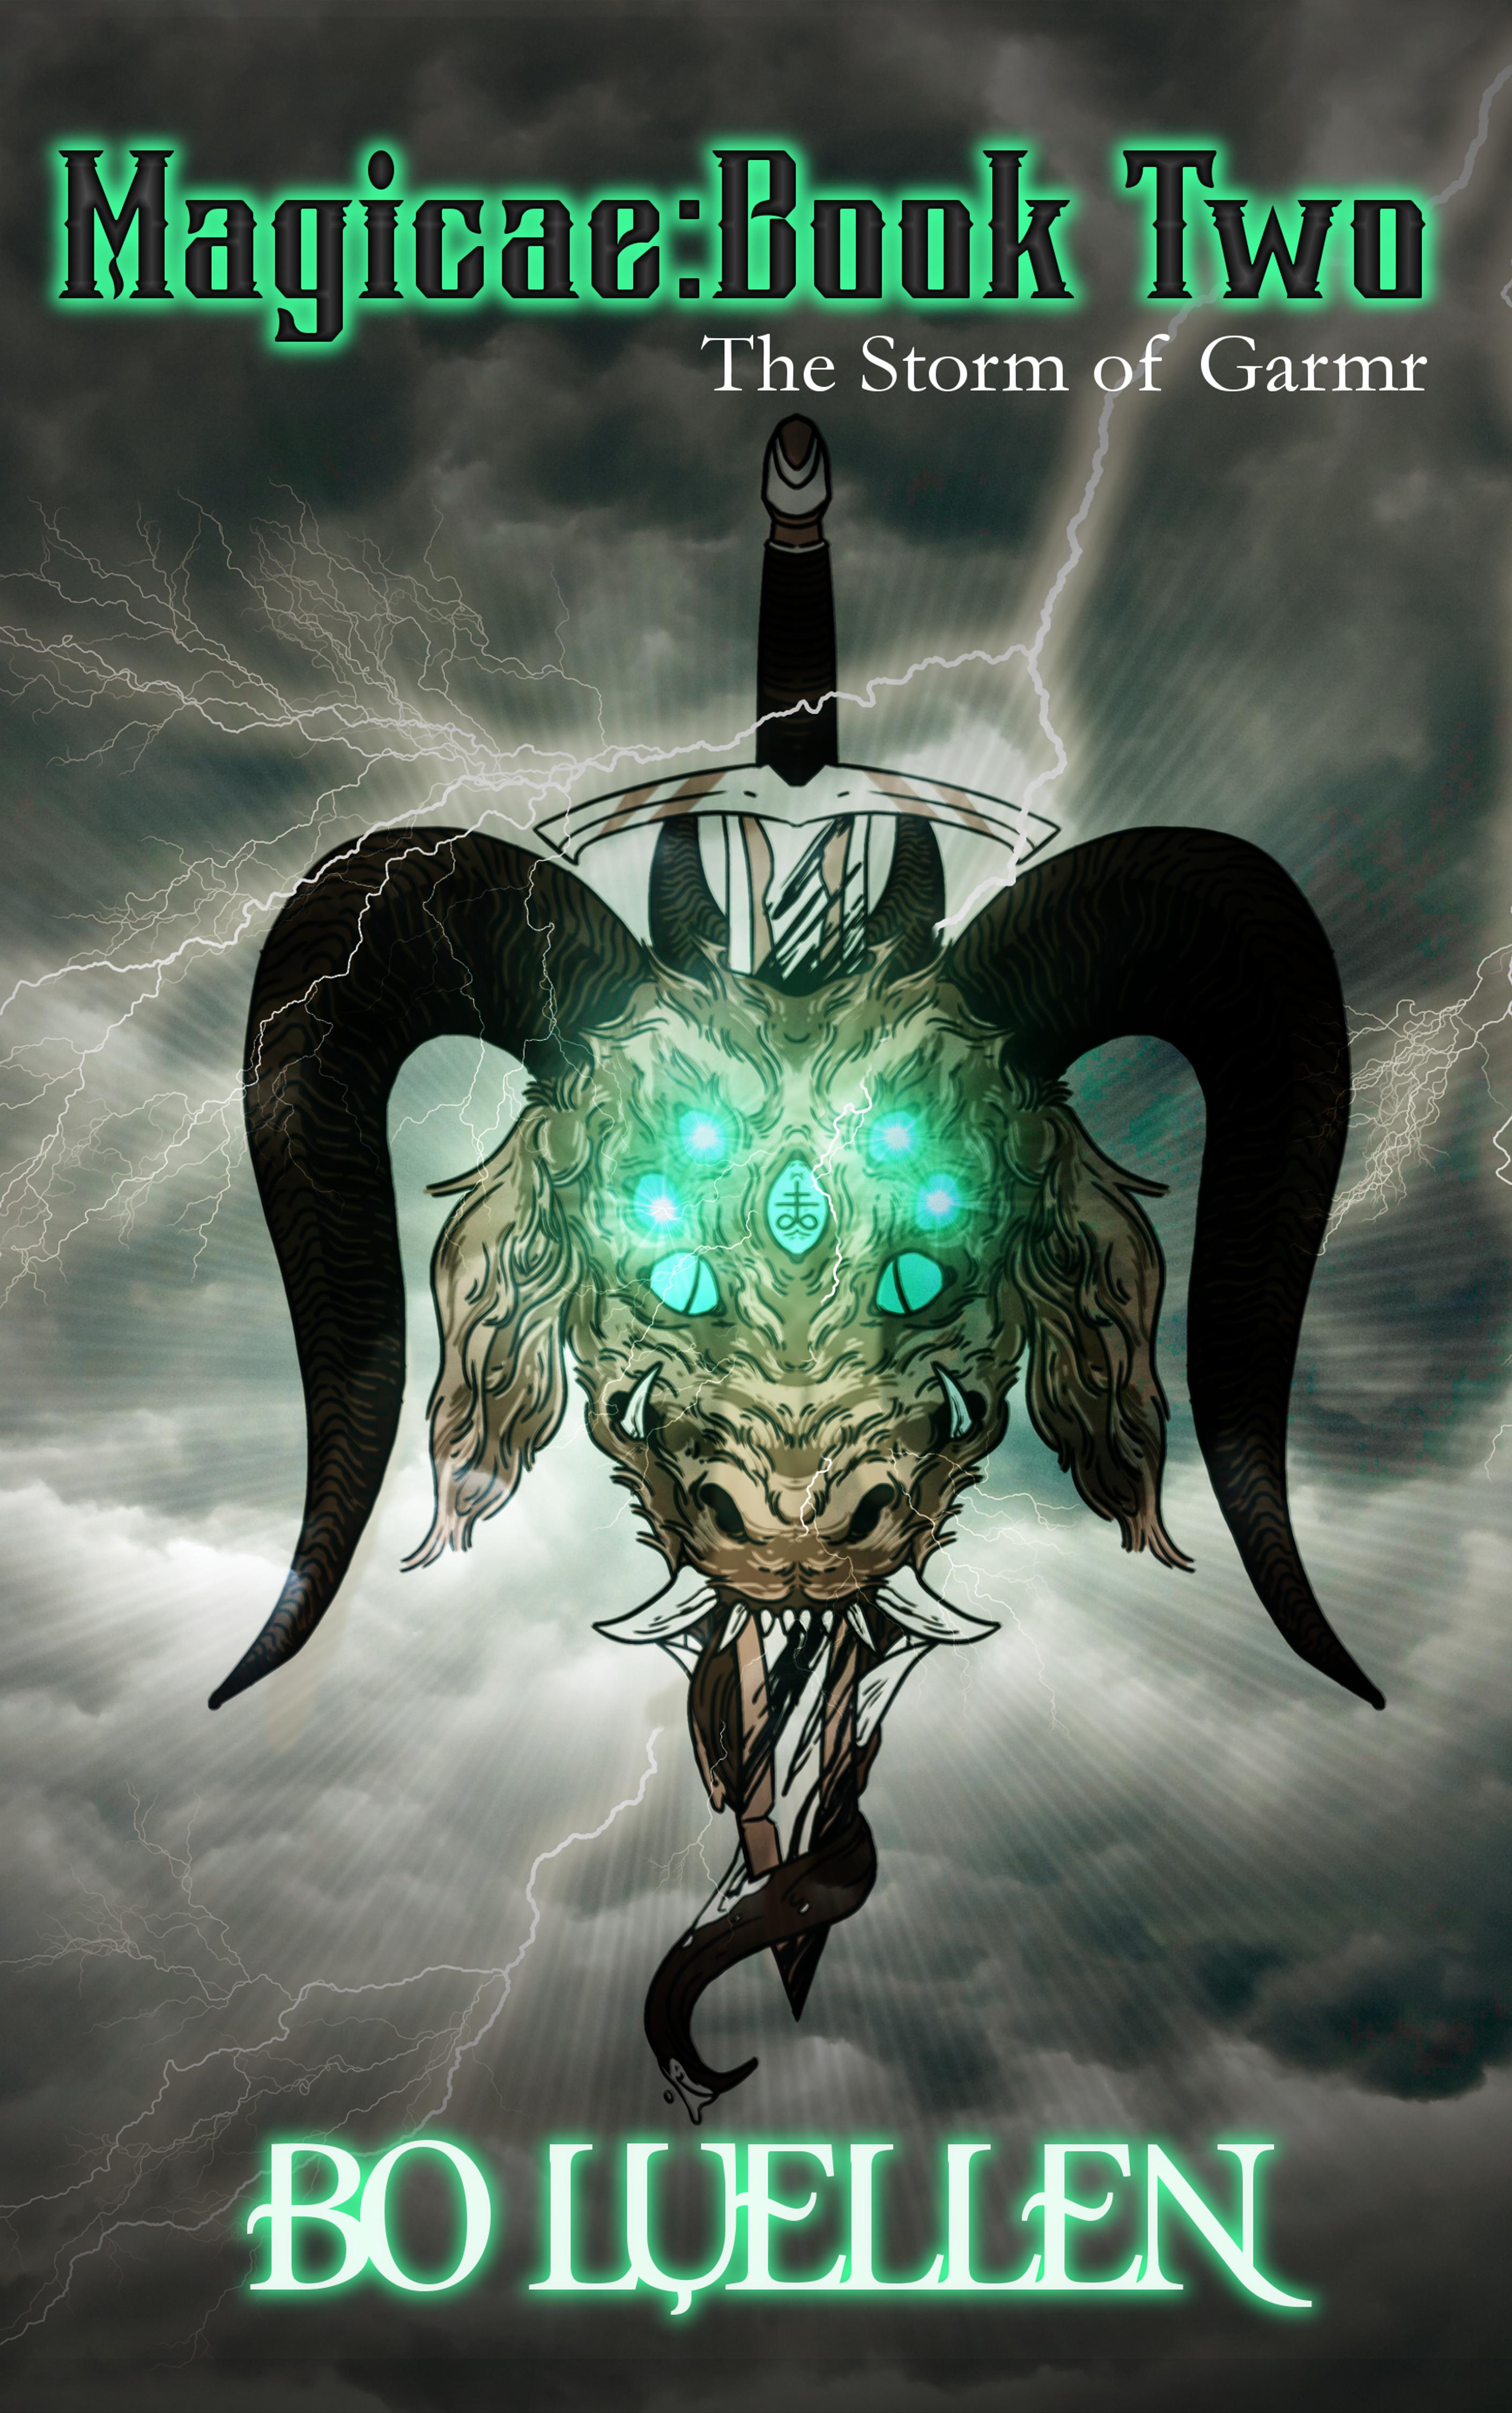 The-Storm-of-Garmr-eBook-Garmond